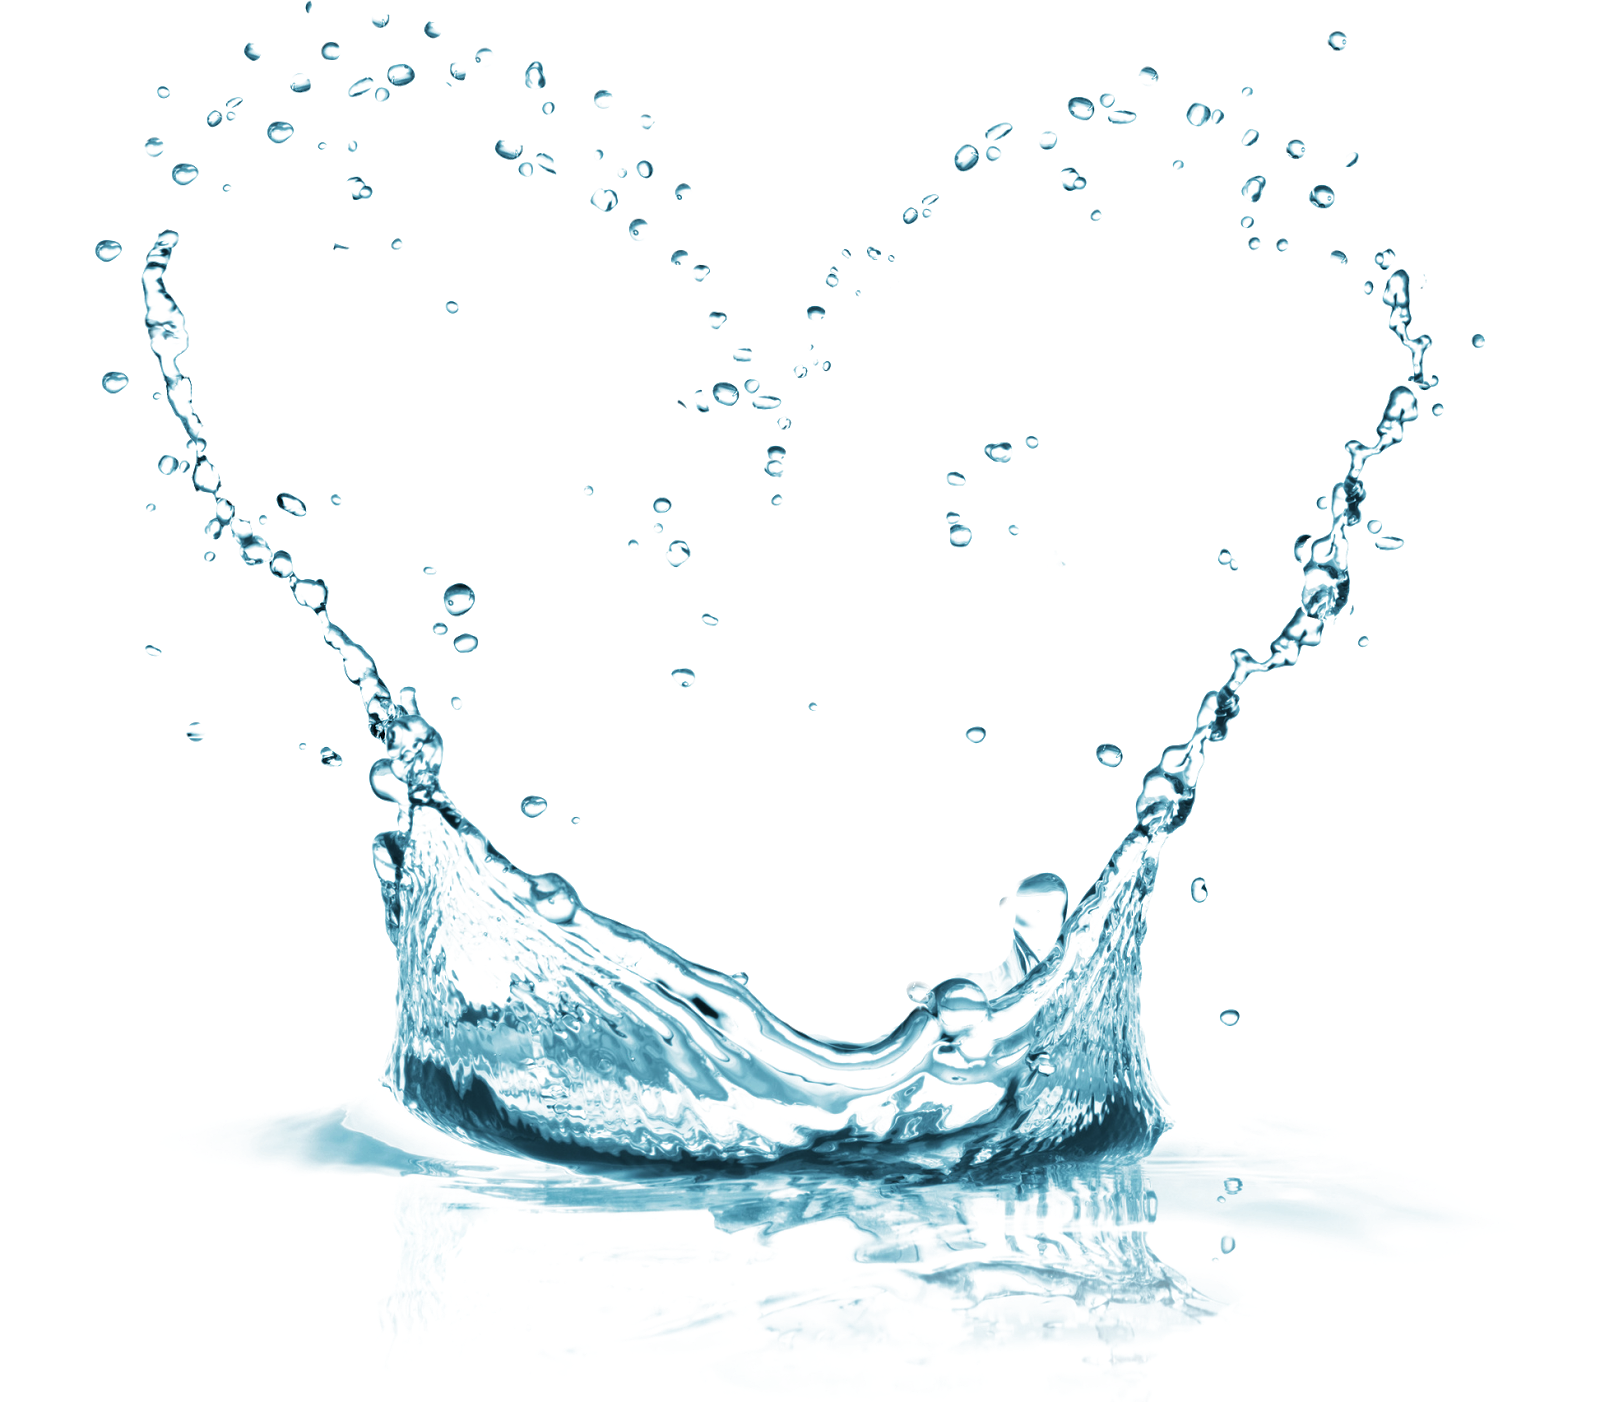 Water Png Water Splash Heart image #721 - Water PNG